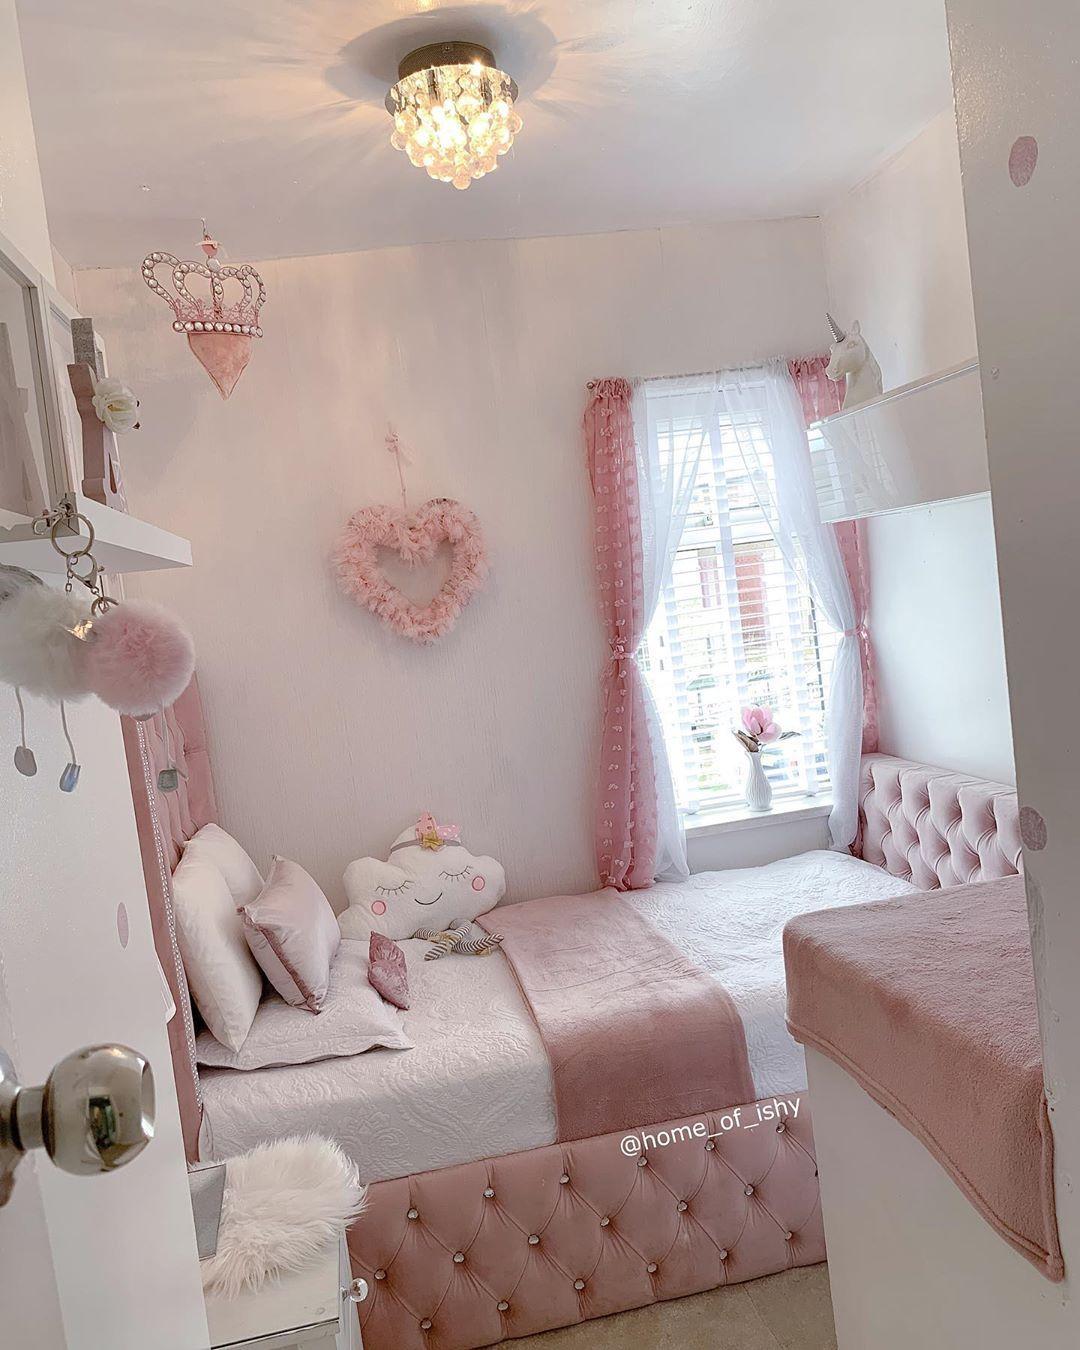 happy saturday everyone 💞 have a fab weekend  x  ——————————————————————— #greydecor #whitedecor #neutraldecor #cleanhome #bedroominspo #homesense #hom...